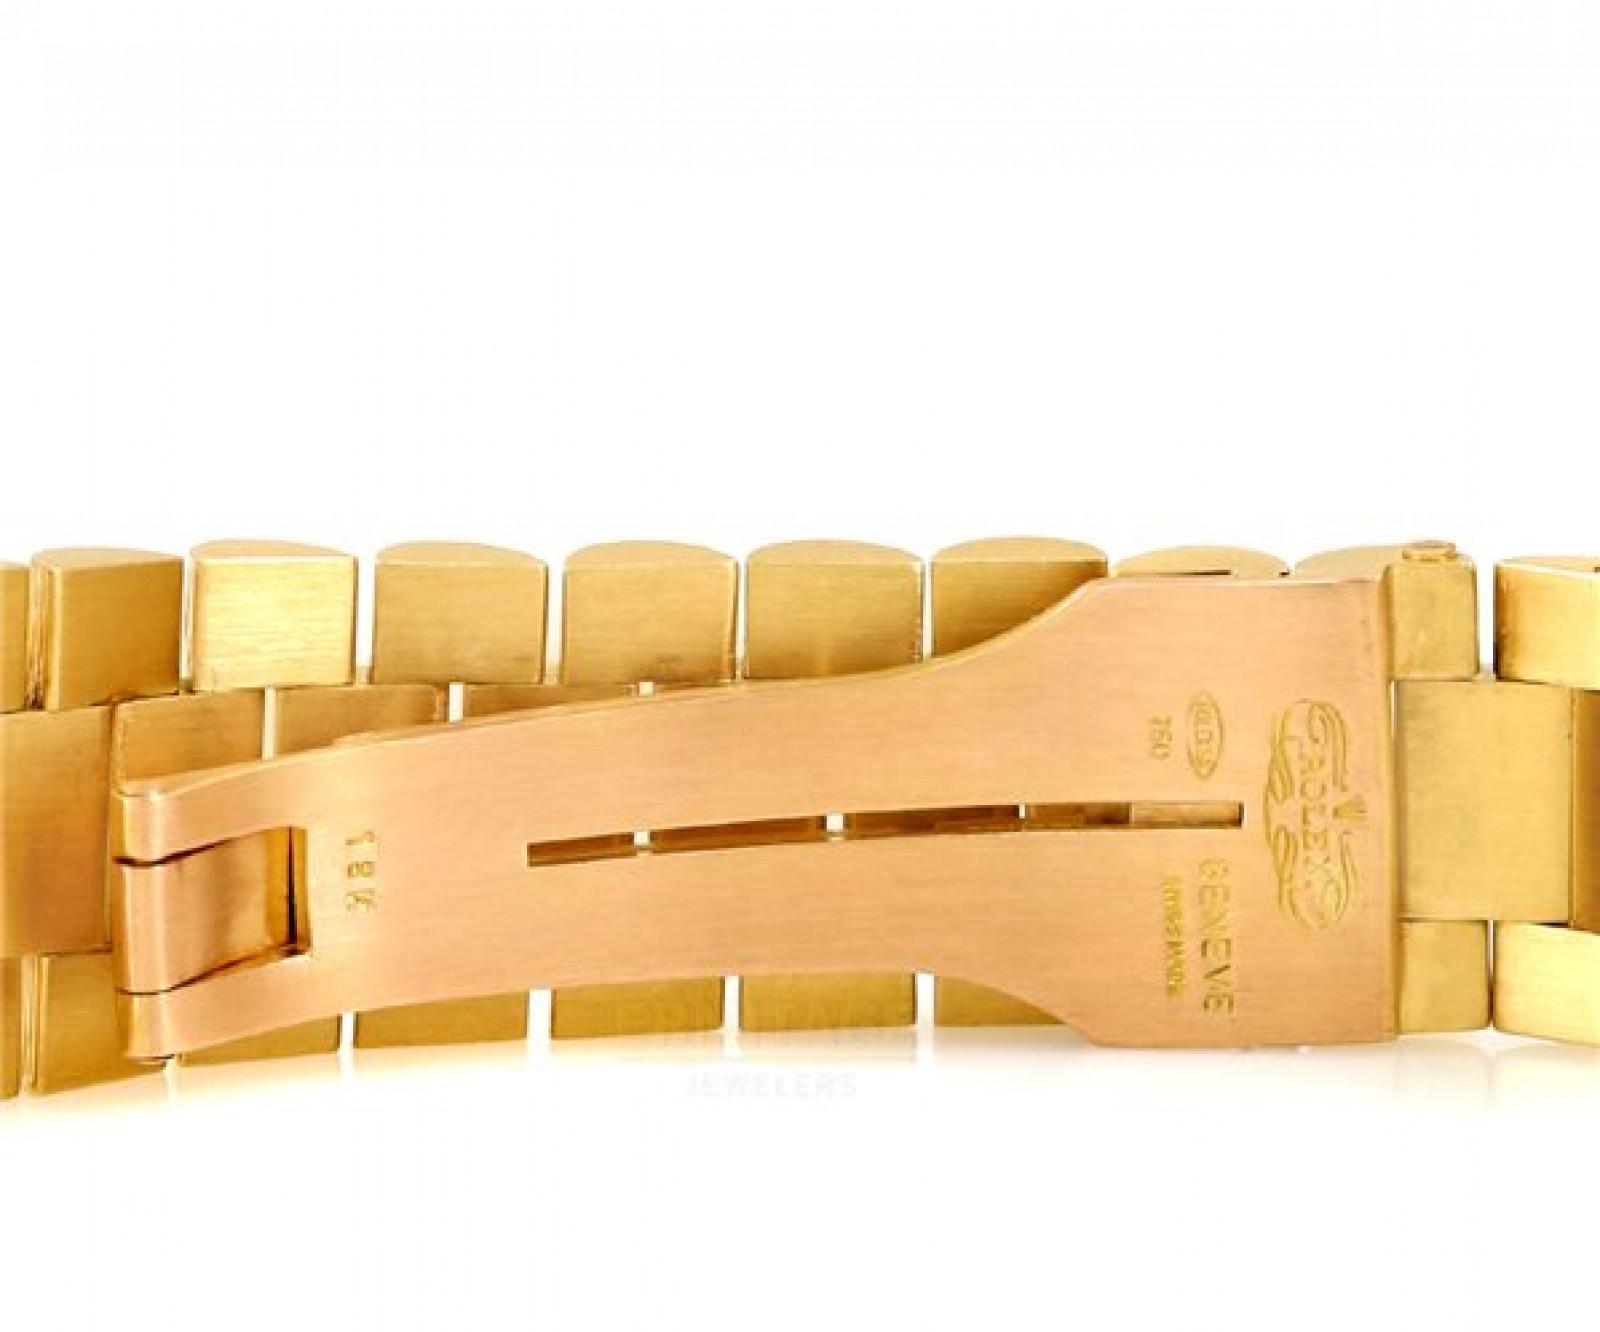 Vintage Rolex Day-Date 1803 Gold Year 1970 1970